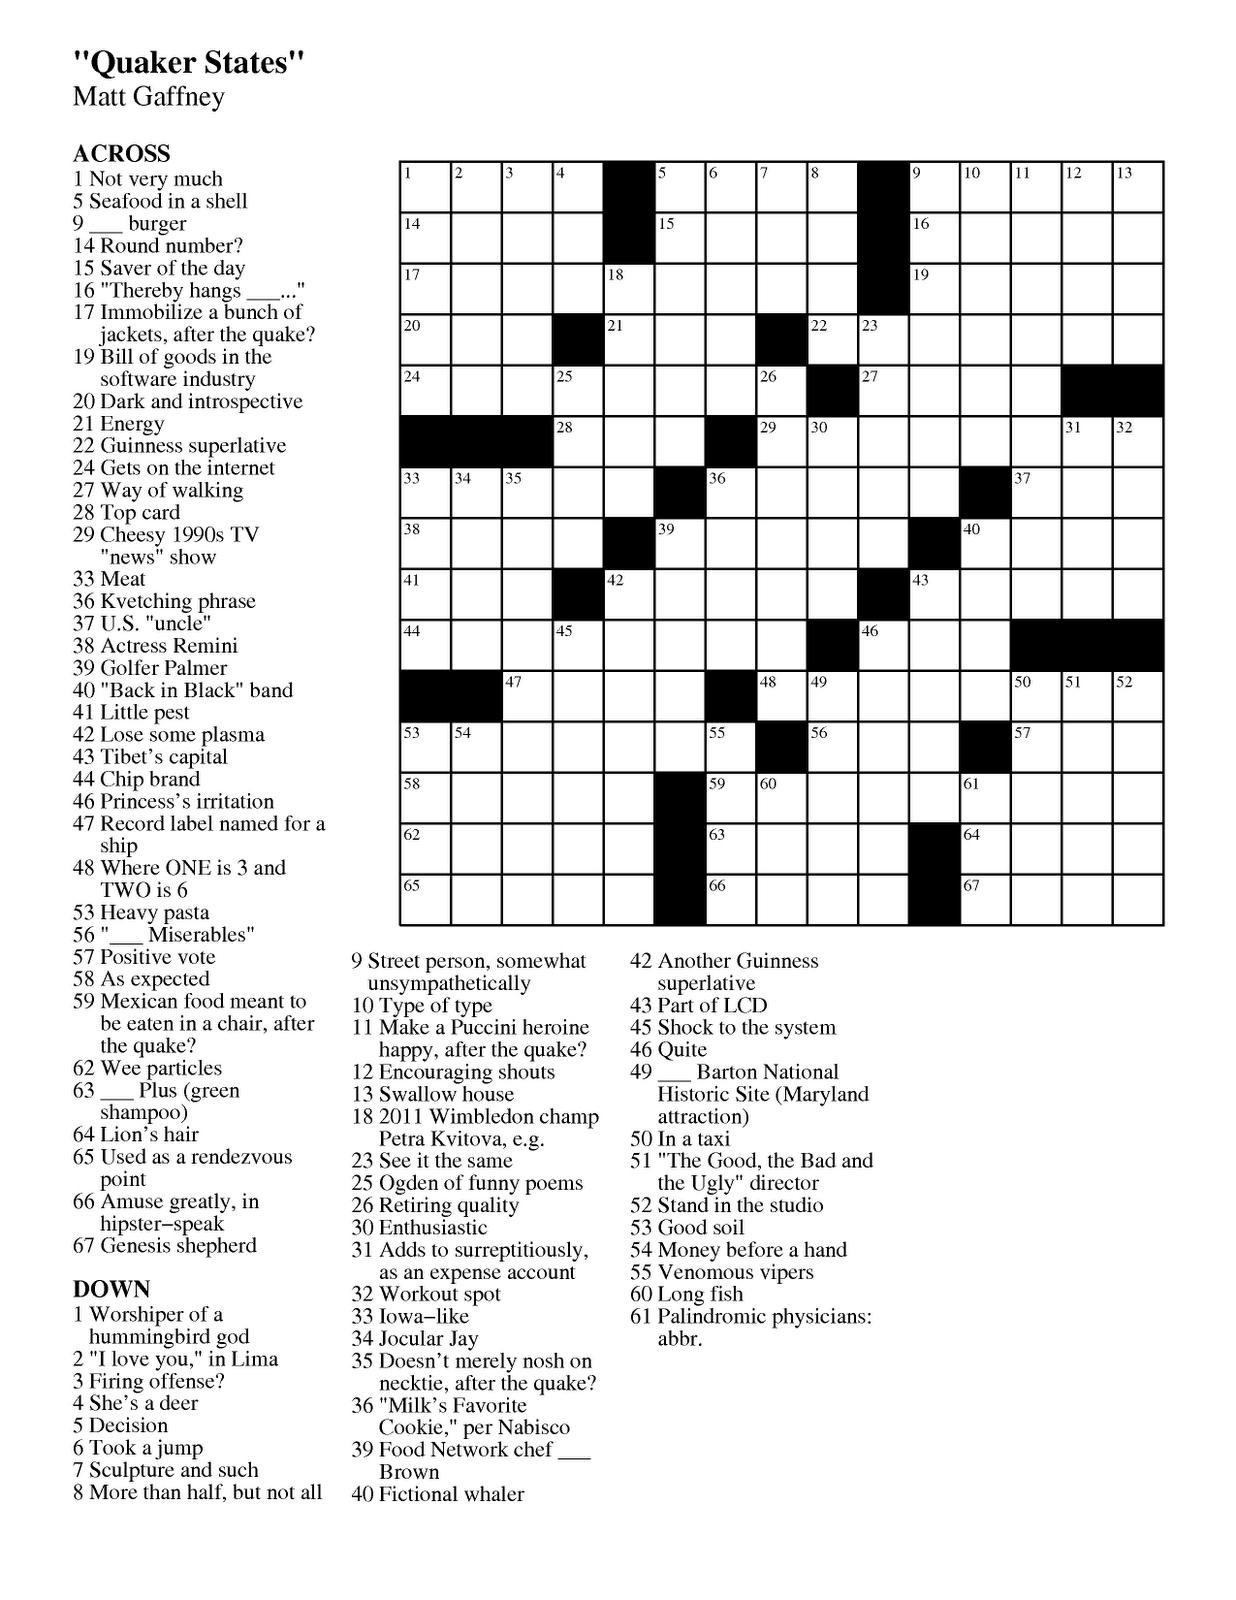 Summer Crossword Puzzle Worksheet - Free Esl Printable Worksheets - Summer Crossword Puzzle Printable Middle School